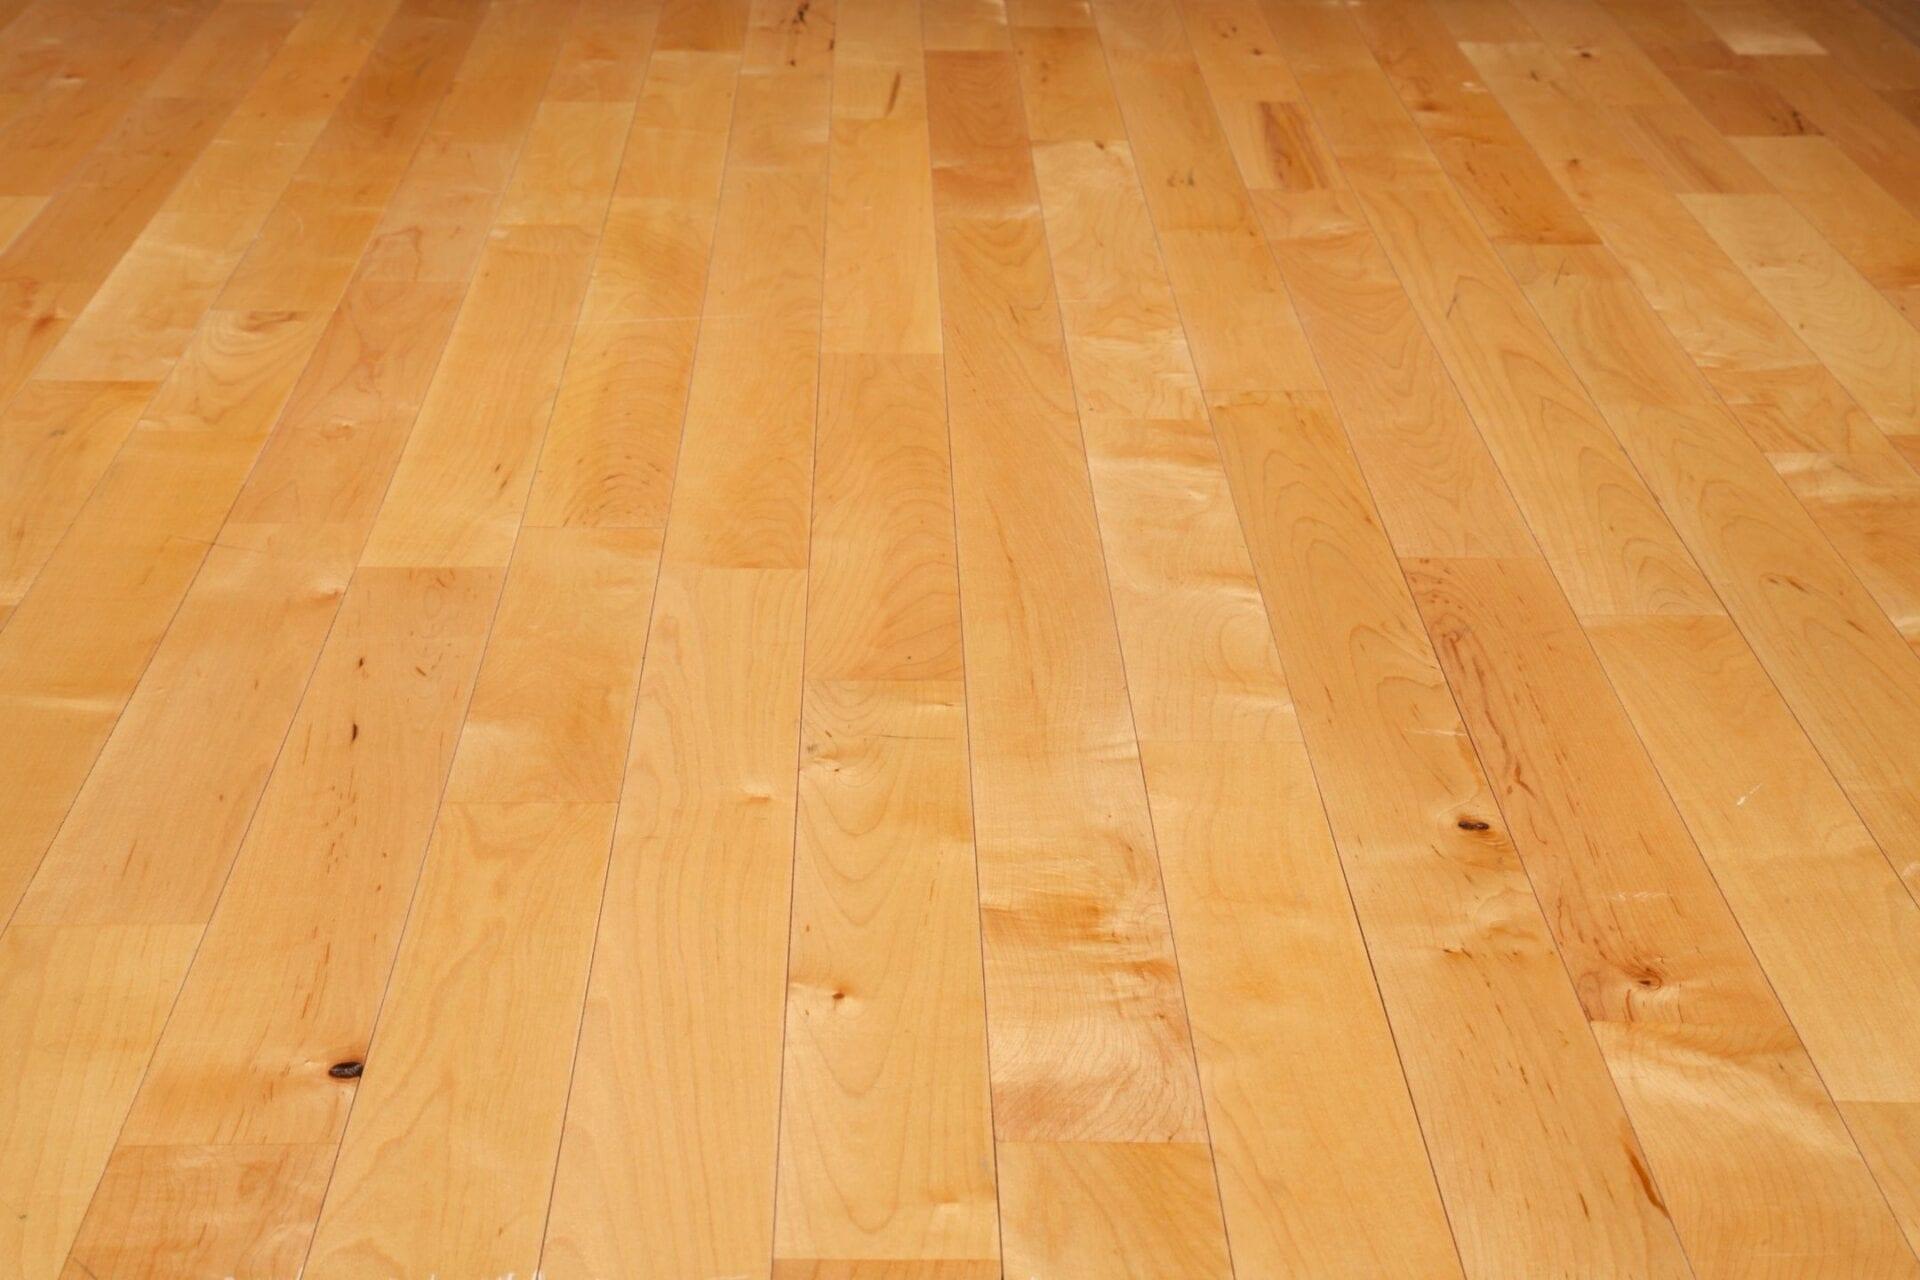 Hardwood vinyl flooring